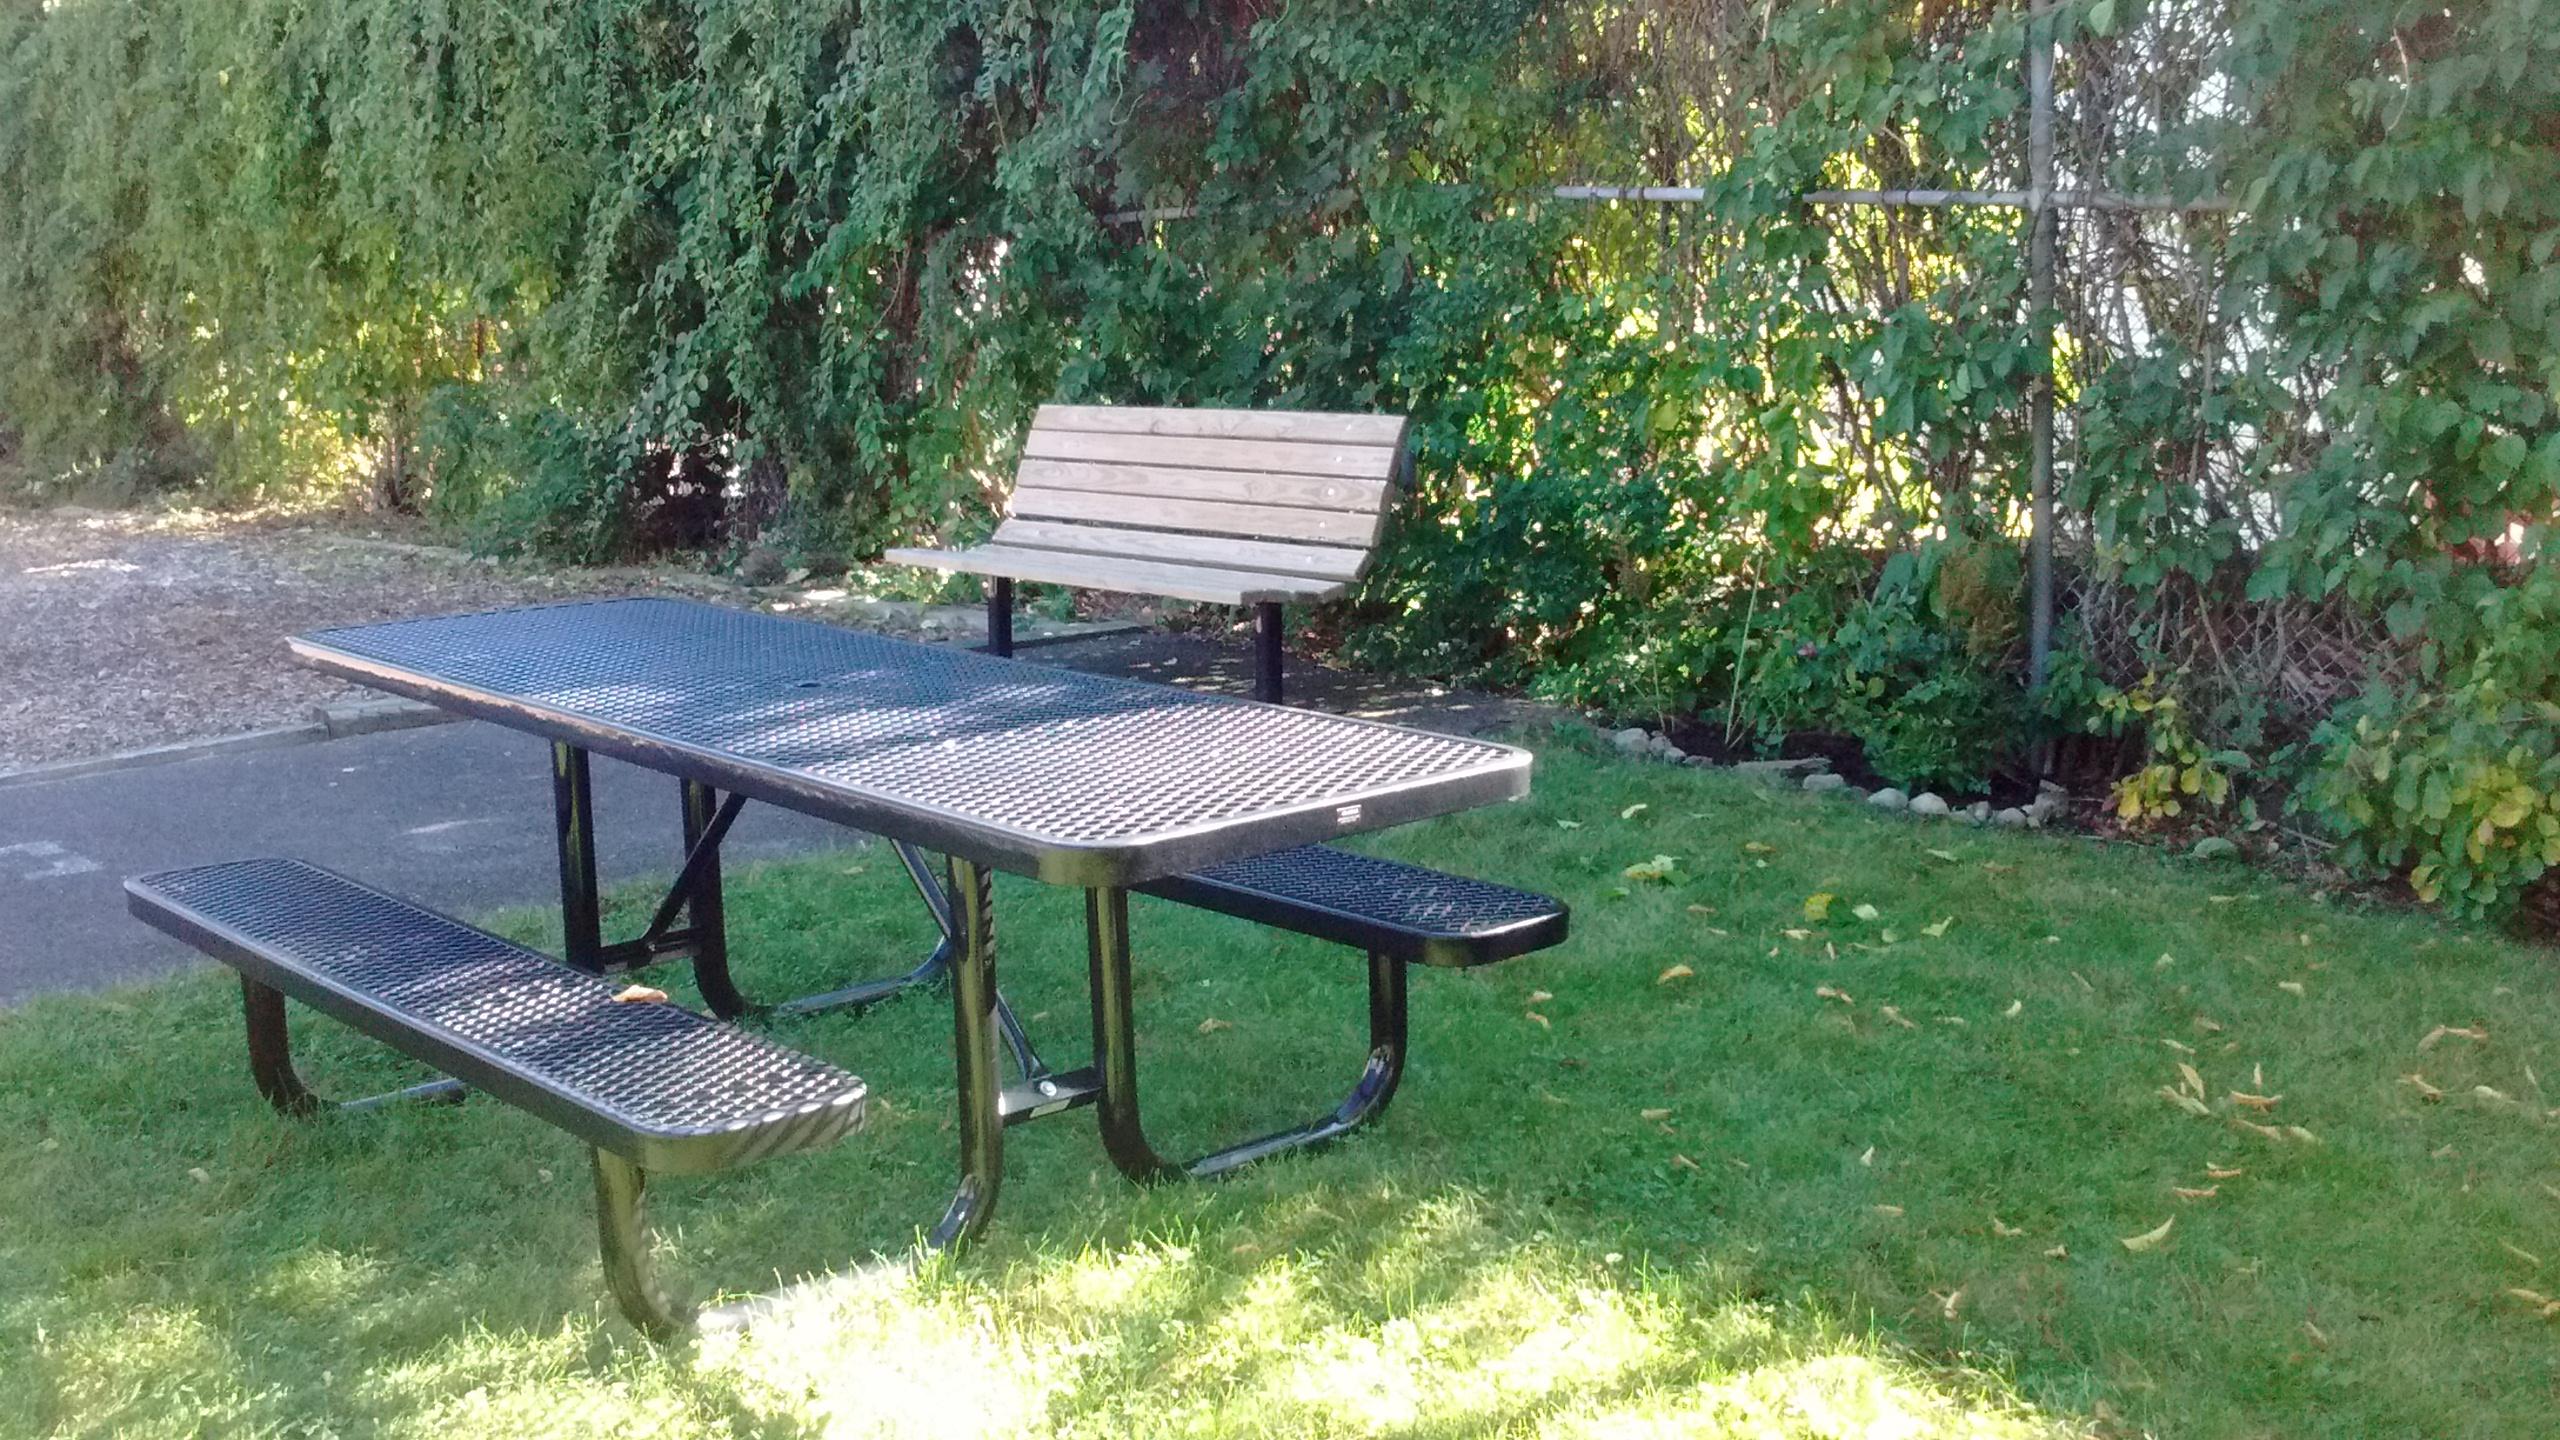 Clark Street Park's New Picnic Table